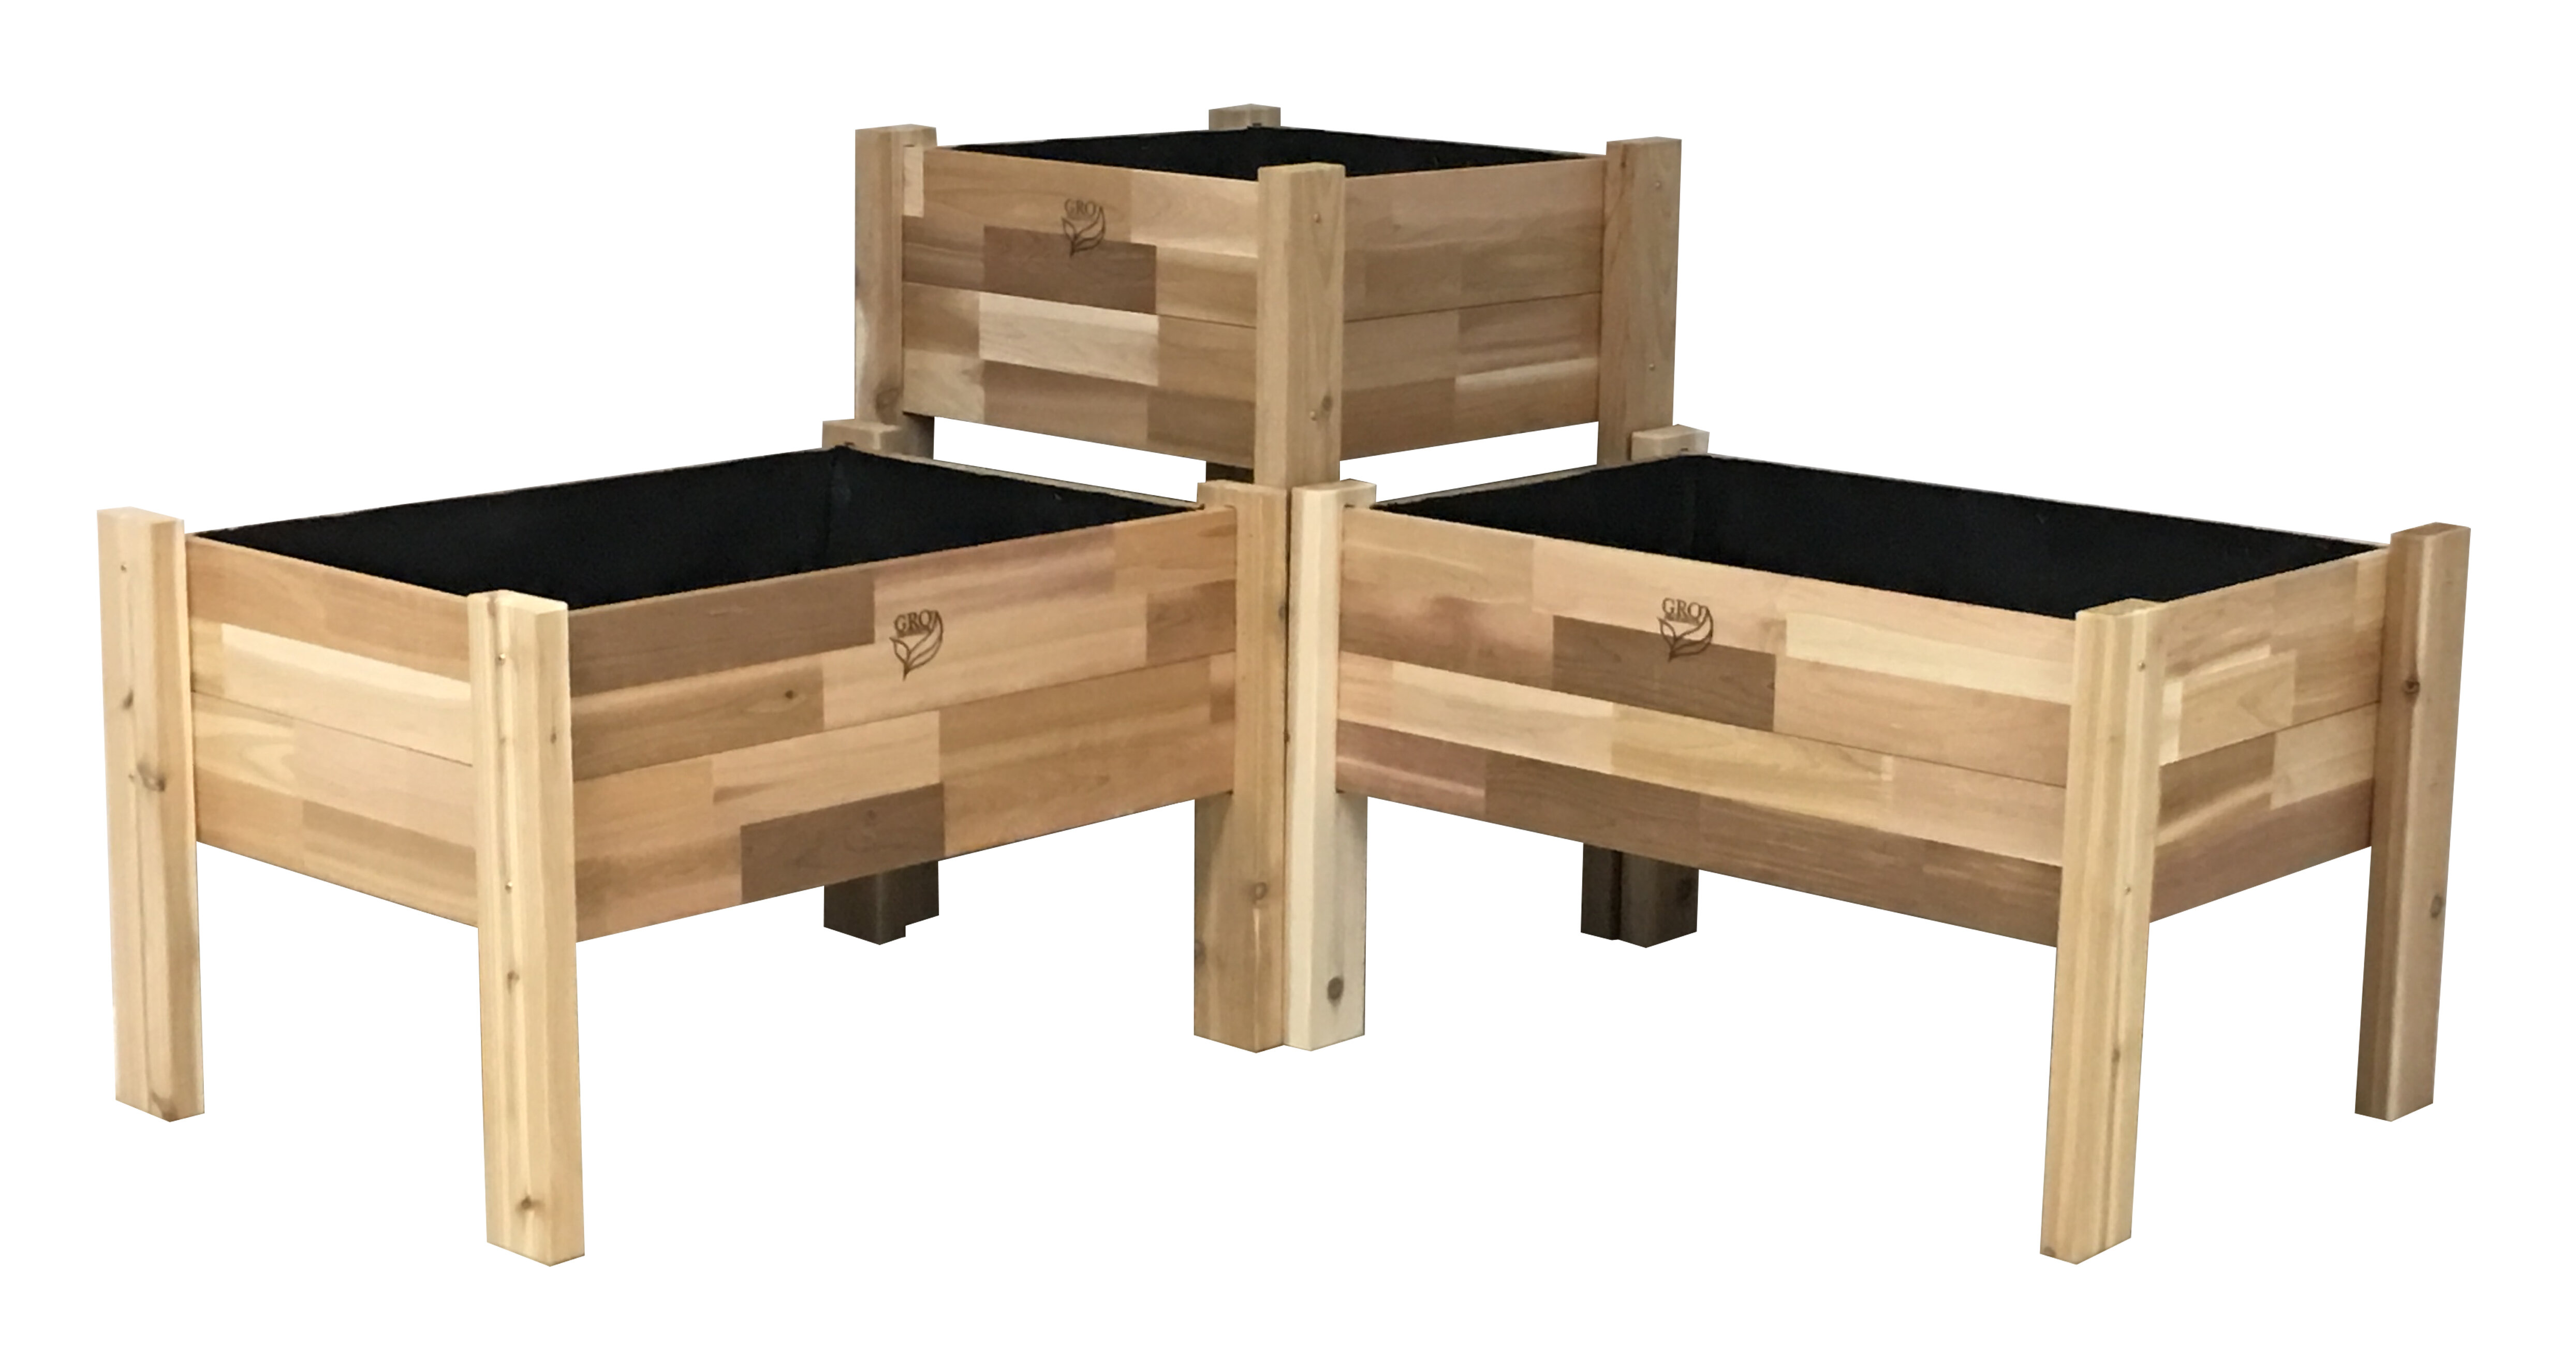 Incroyable August Grove Enloe Cedar Elevated Garden 3 Piece Planter Box Set | Wayfair